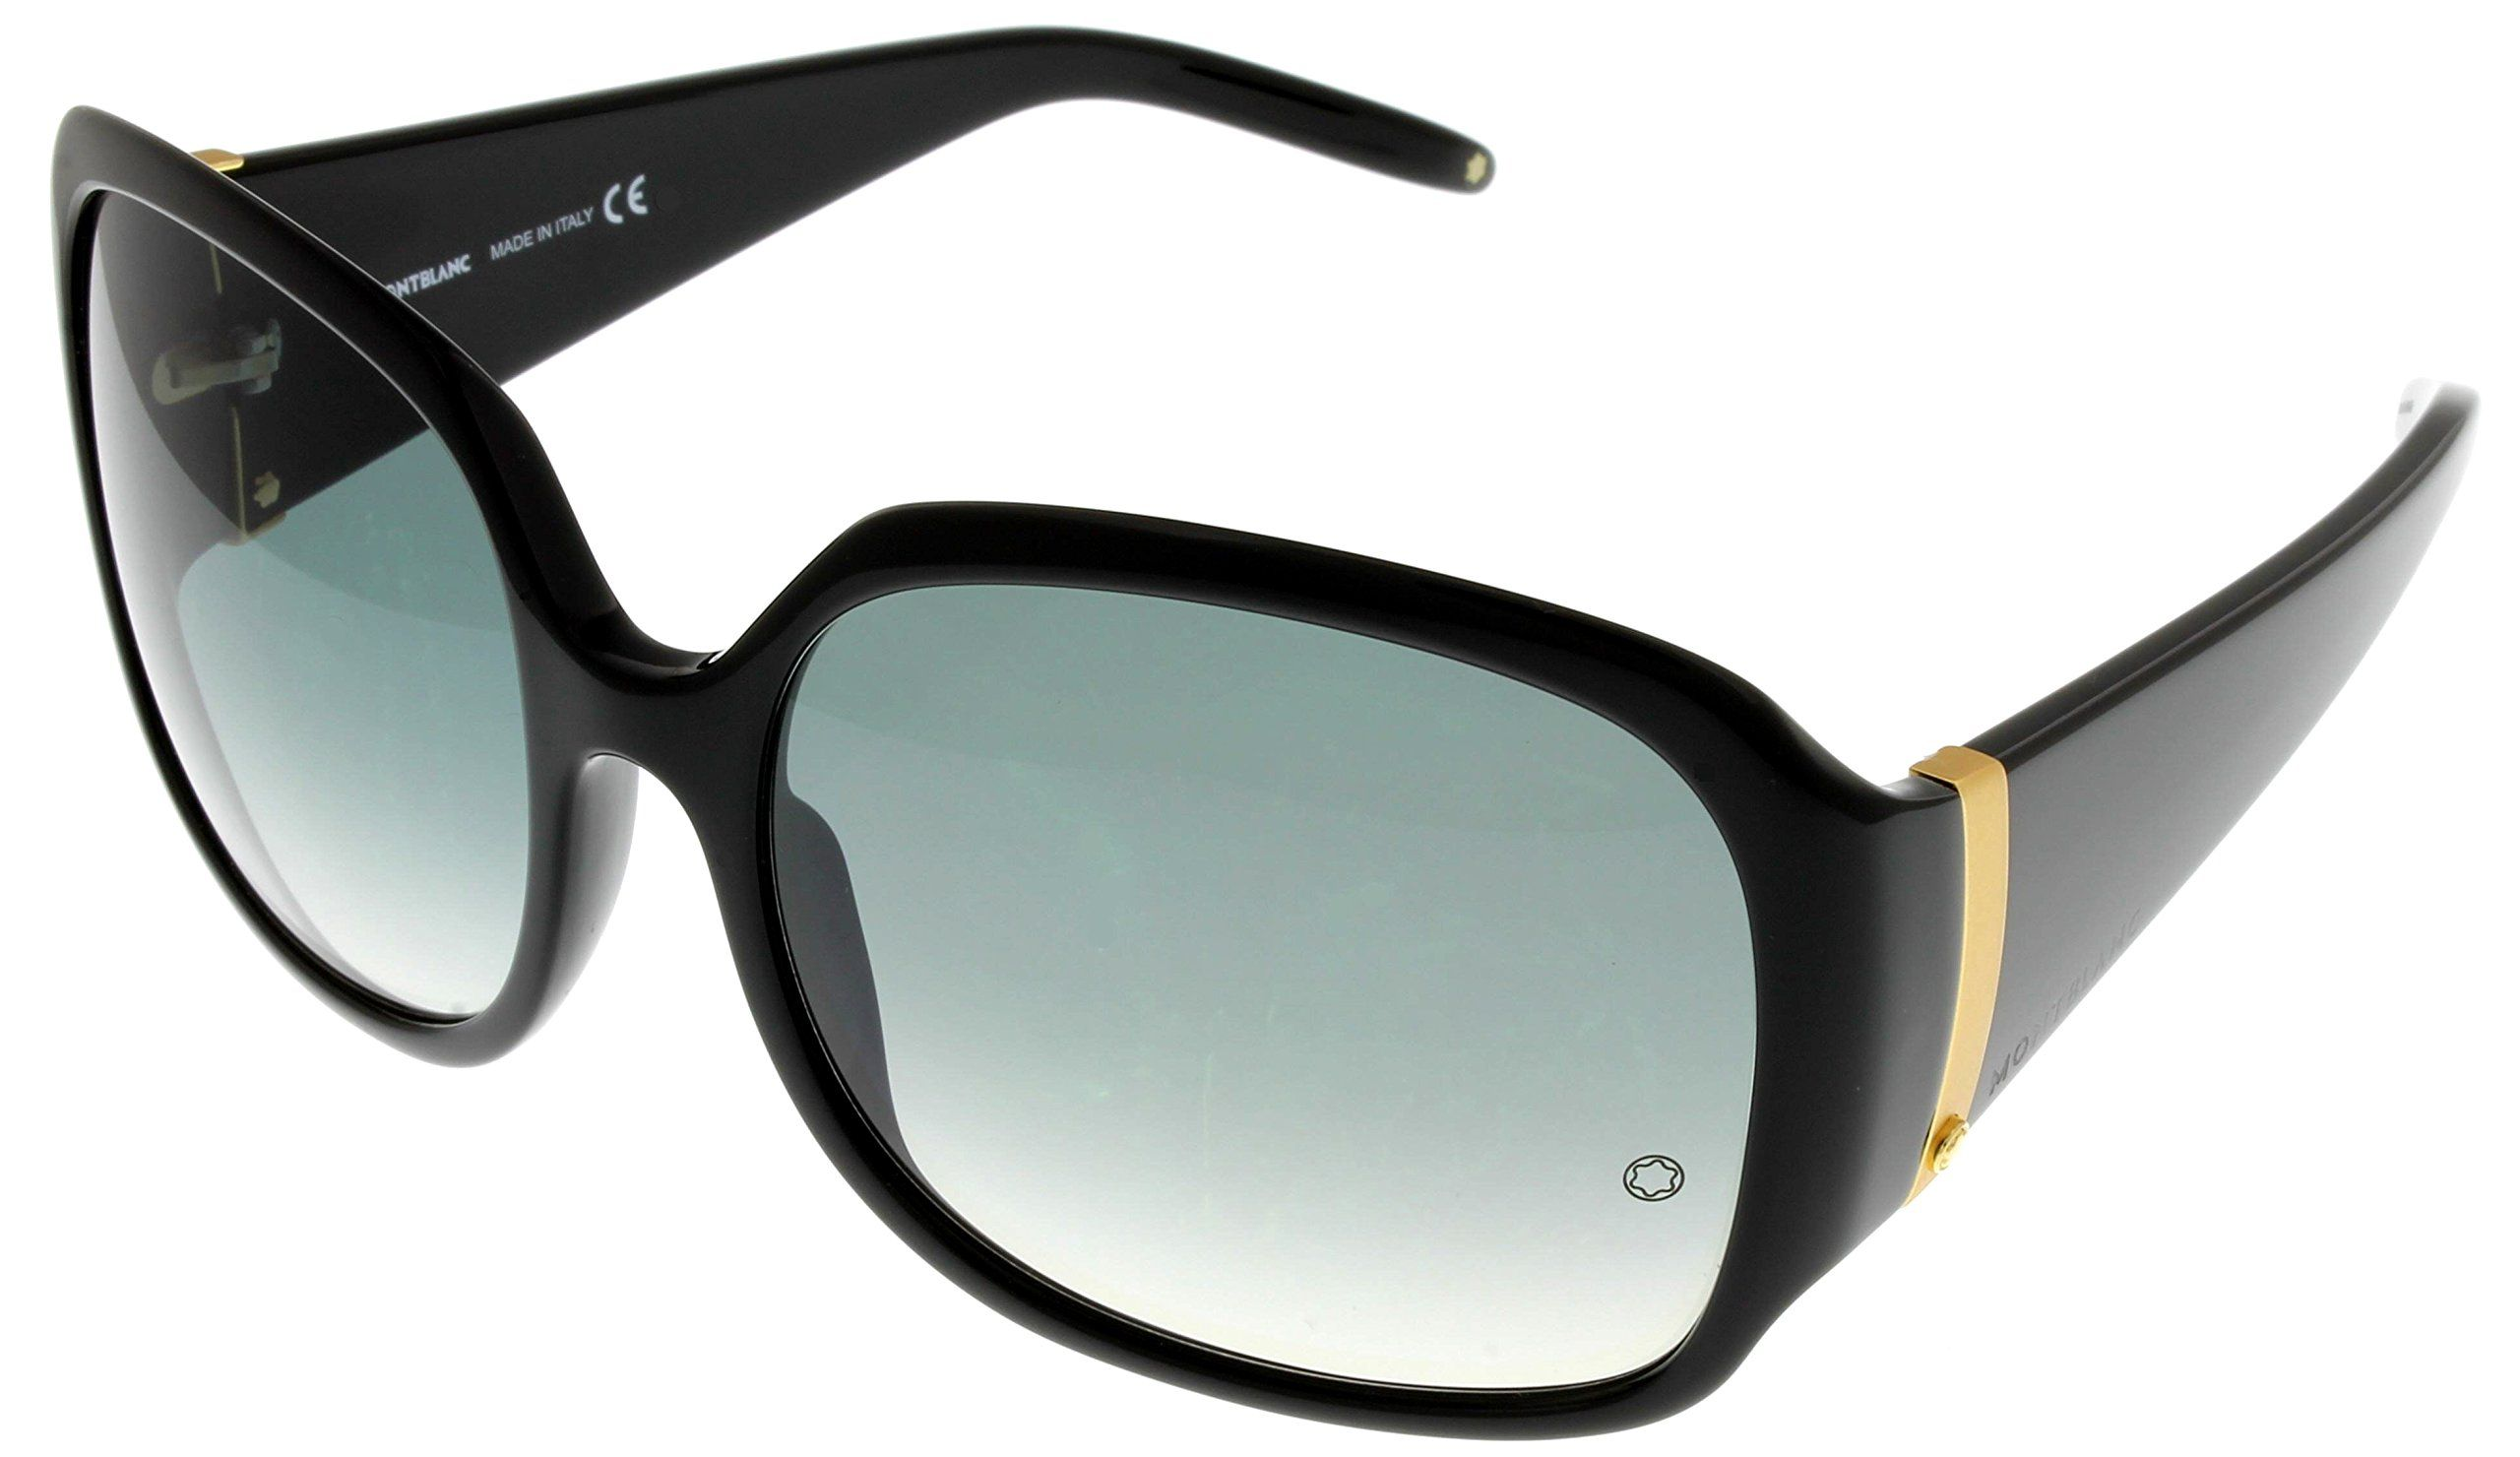 8dfe7f947d Mont Blanc Sunglasses Womens MB221S 0B5 Black. Frame Color Black. Lens Color